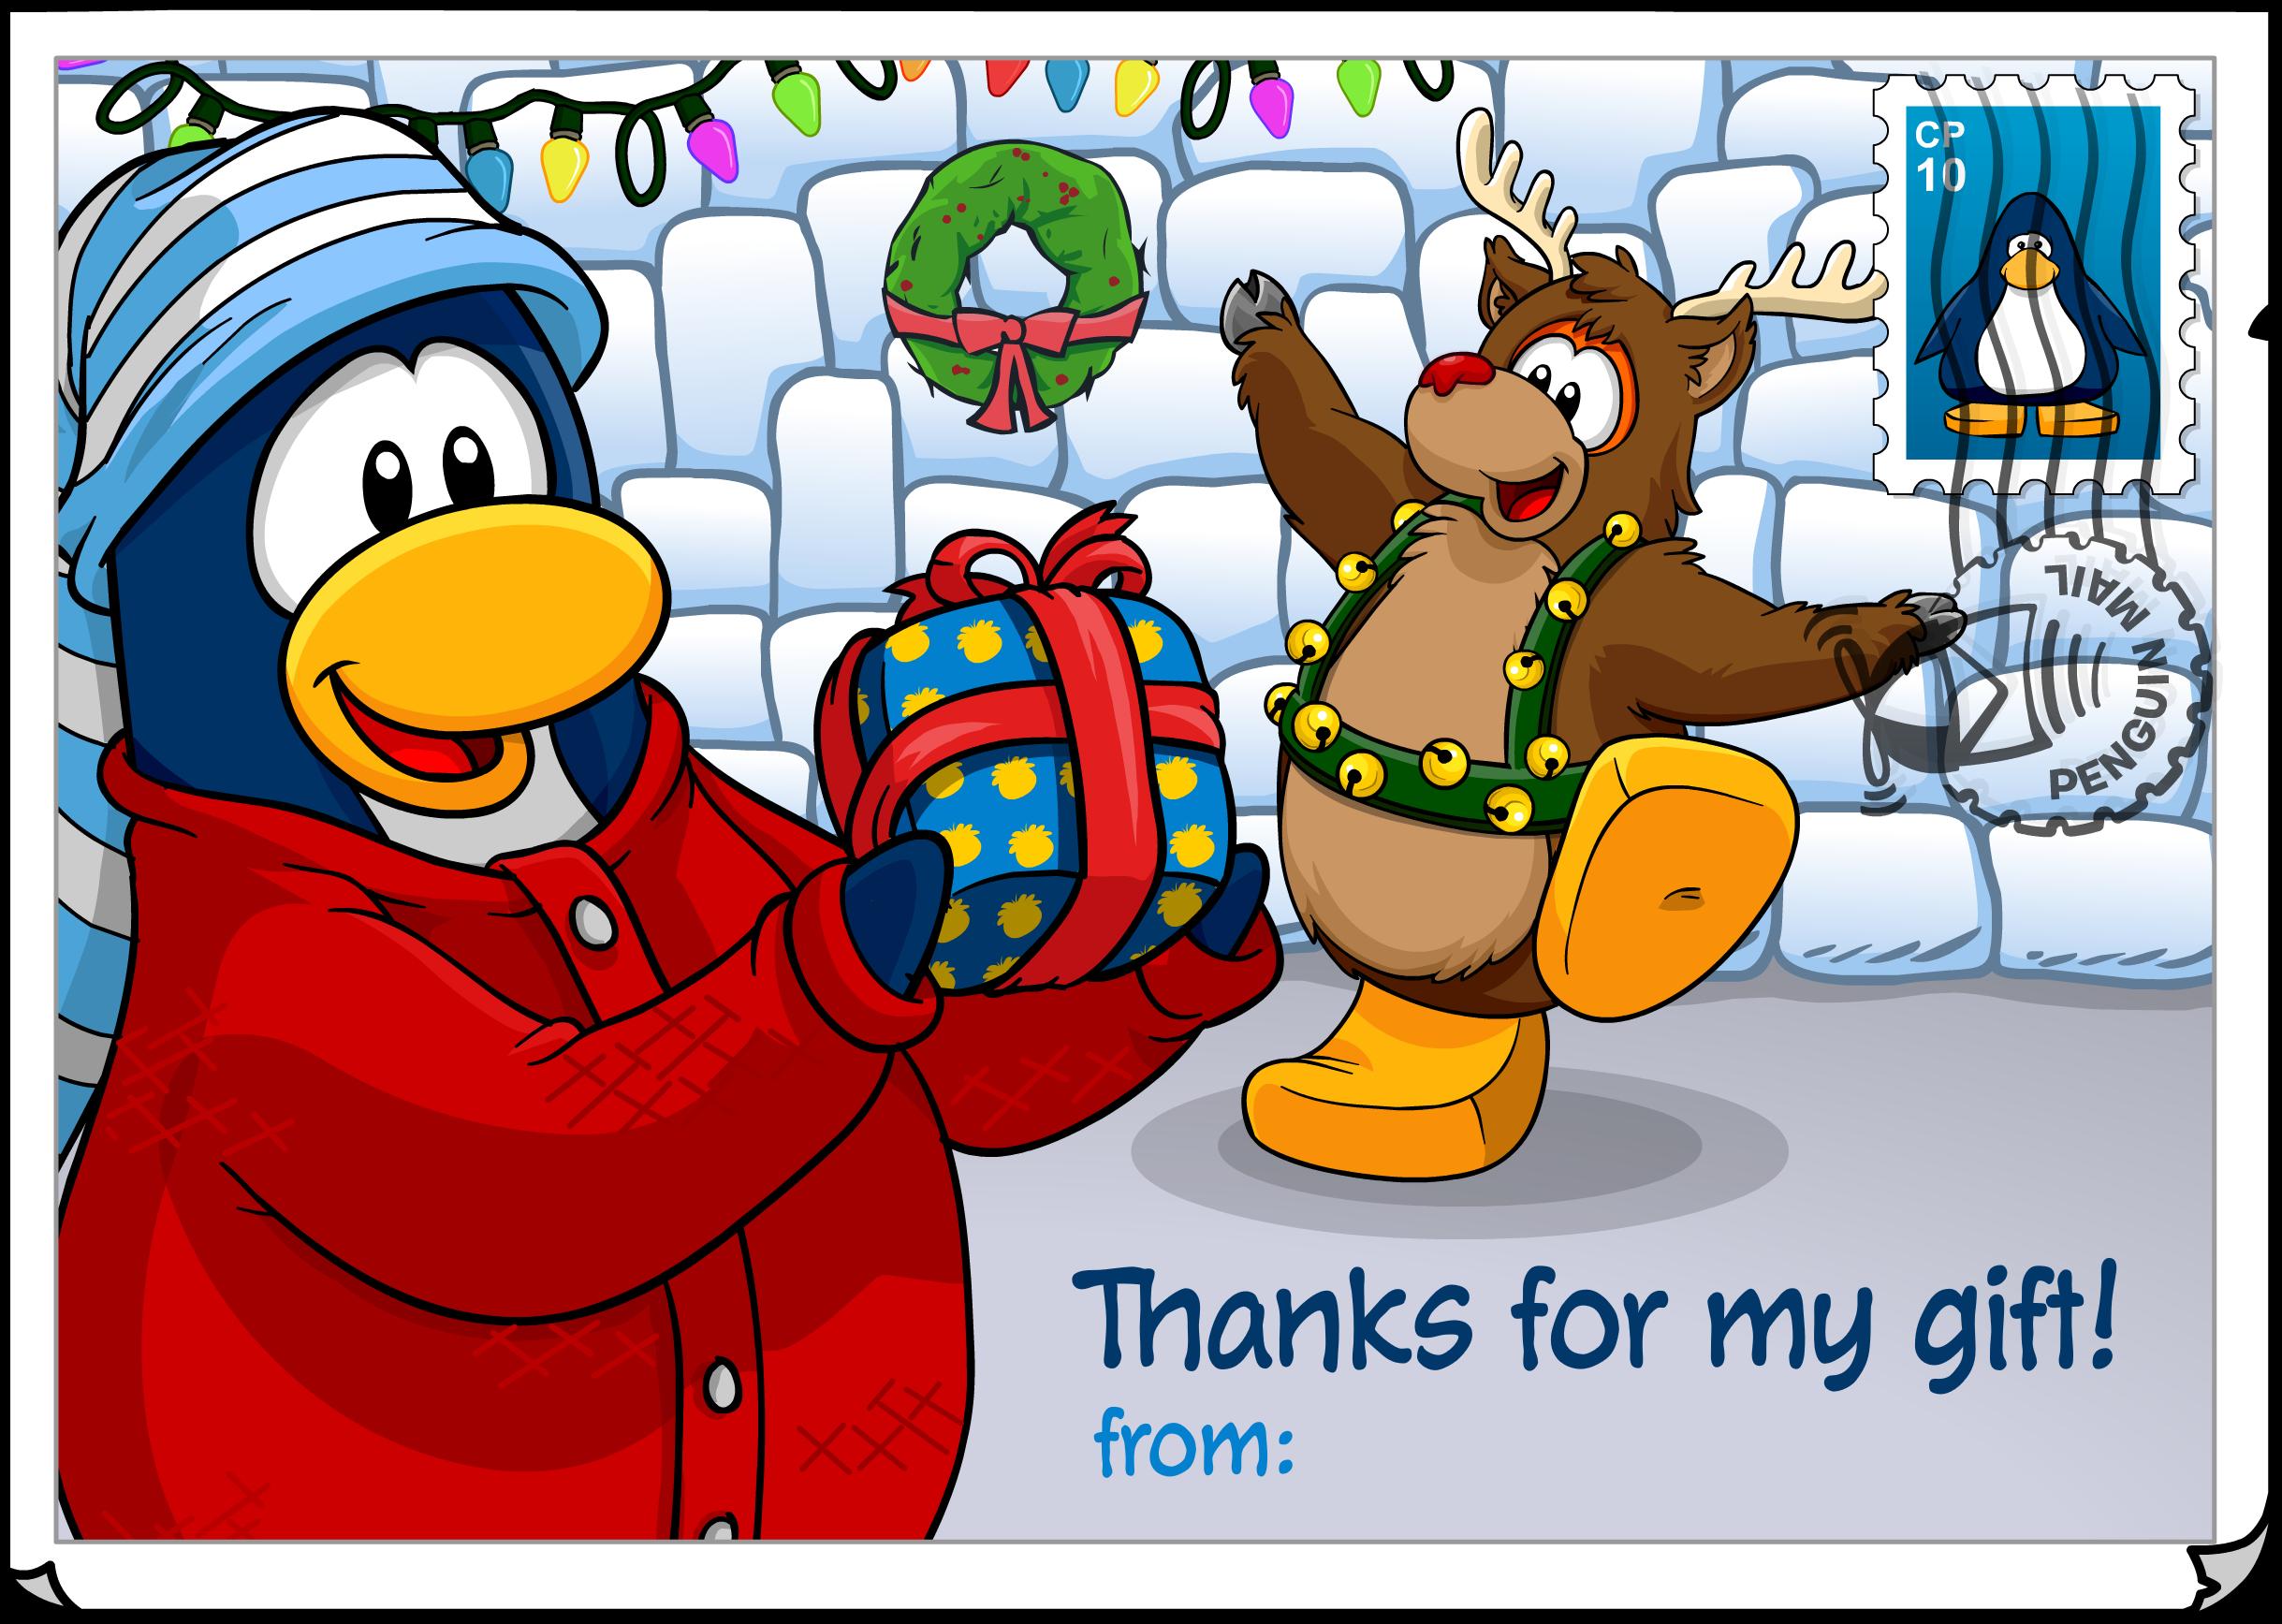 Thanks for Gift Postcard